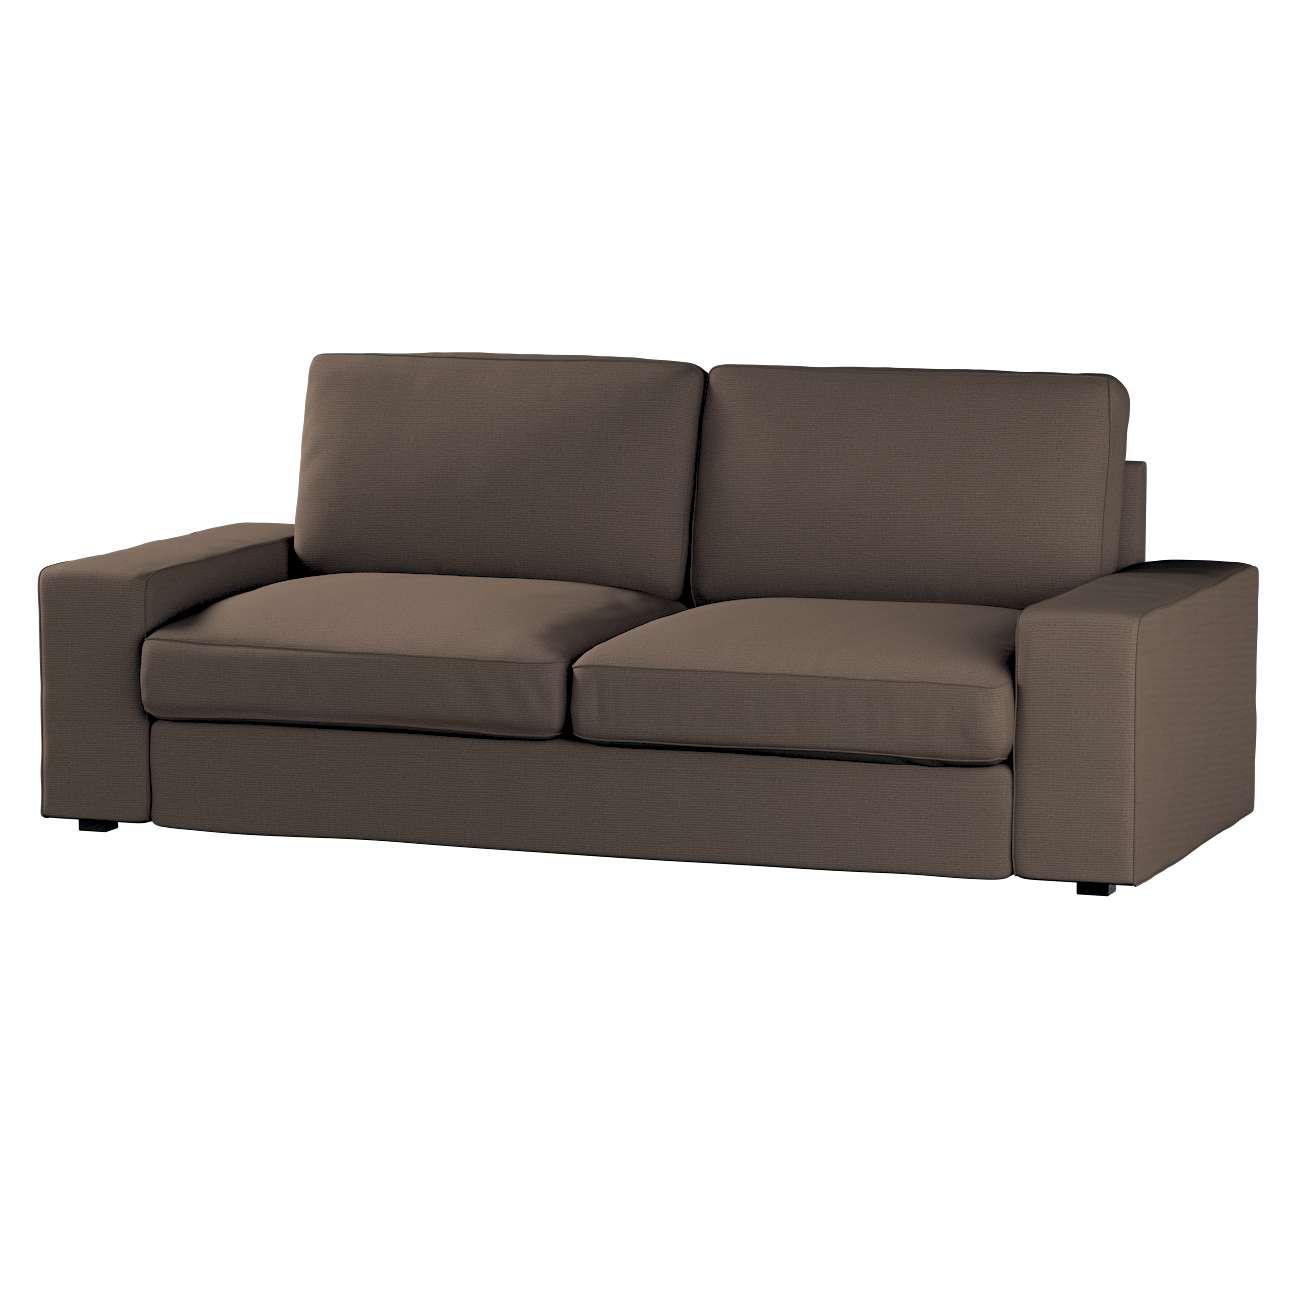 Kivik 3-Sitzer Sofabezug von der Kollektion Etna, Stoff: 705-08